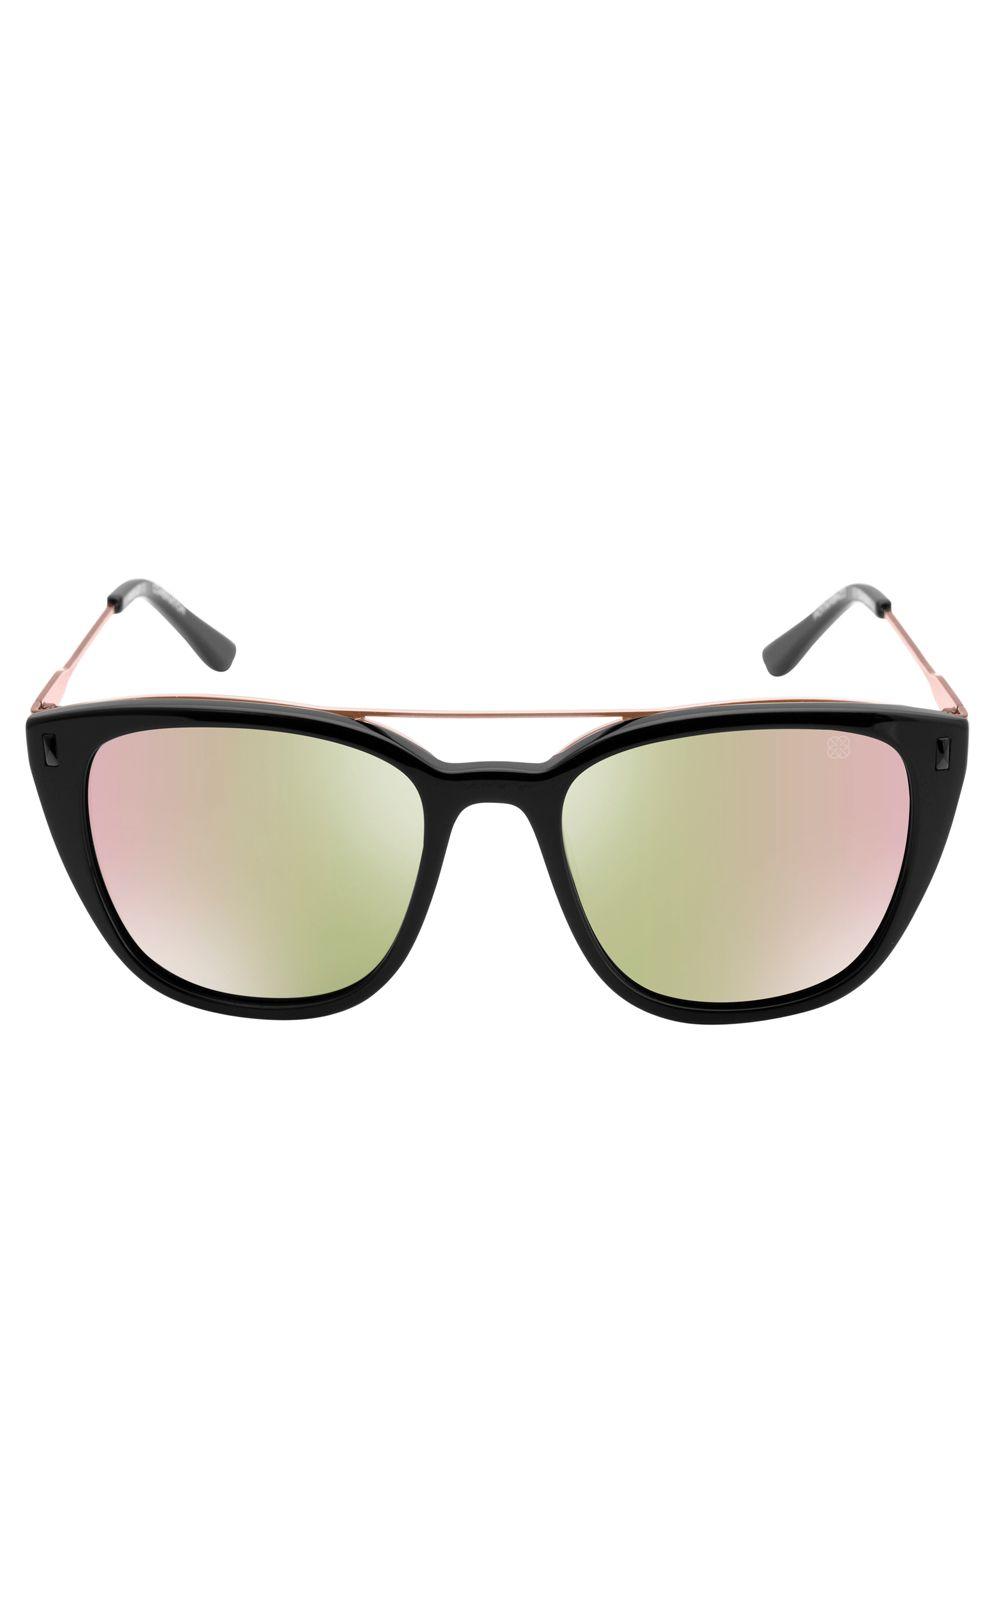 Foto 1 - Óculos Euro Fashion Basics Preto E0039A2910/4J